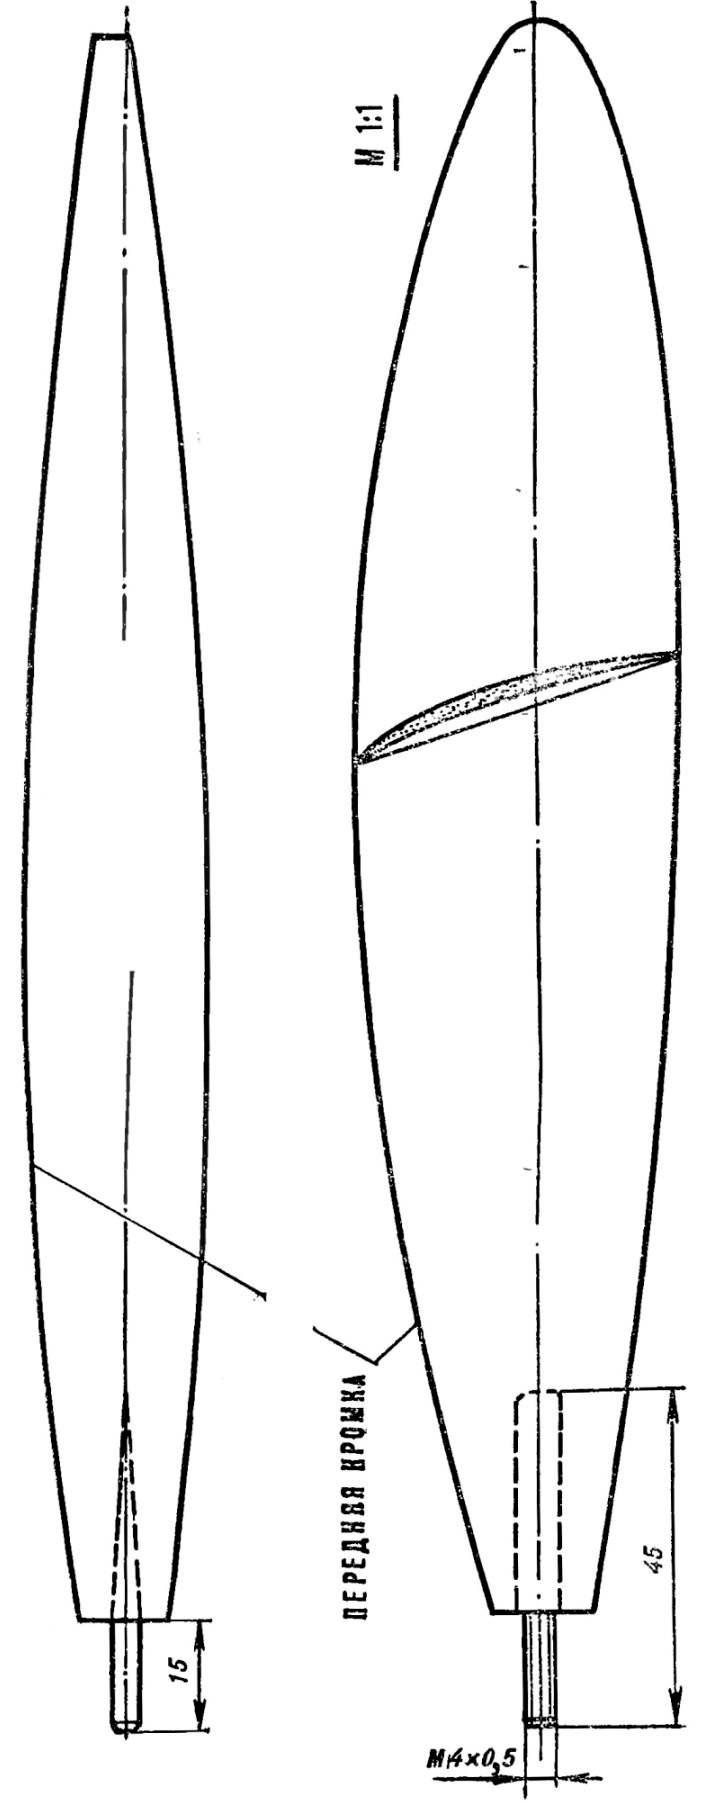 Рис. 2. Шаблоны лопасти винта.